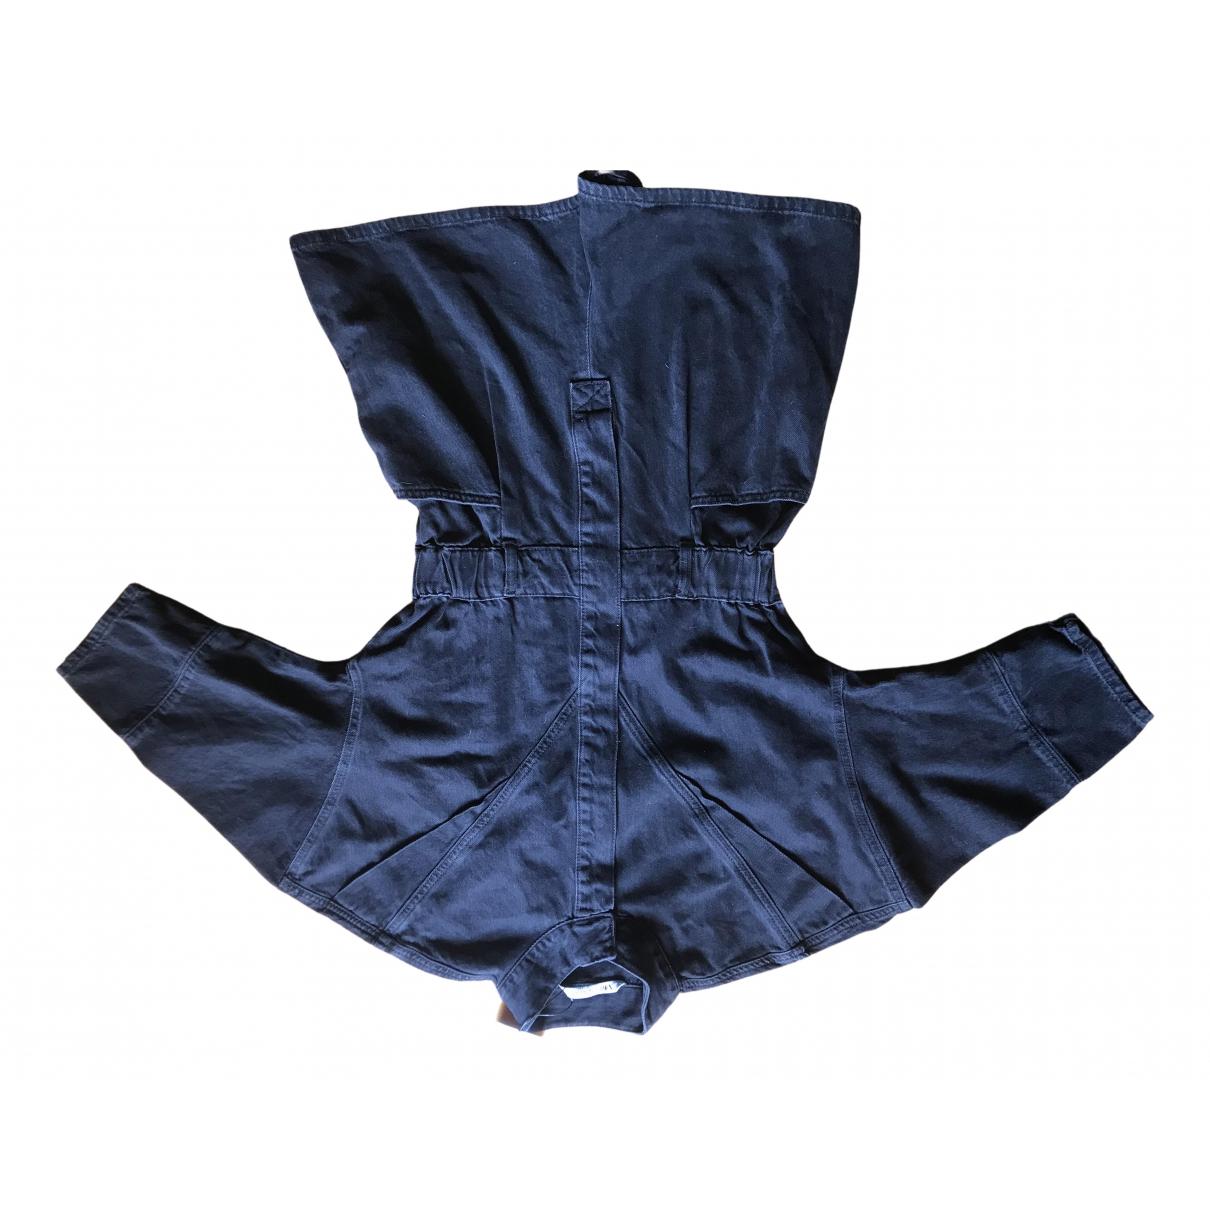 Zara N Black Denim - Jeans jumpsuit for Women M International